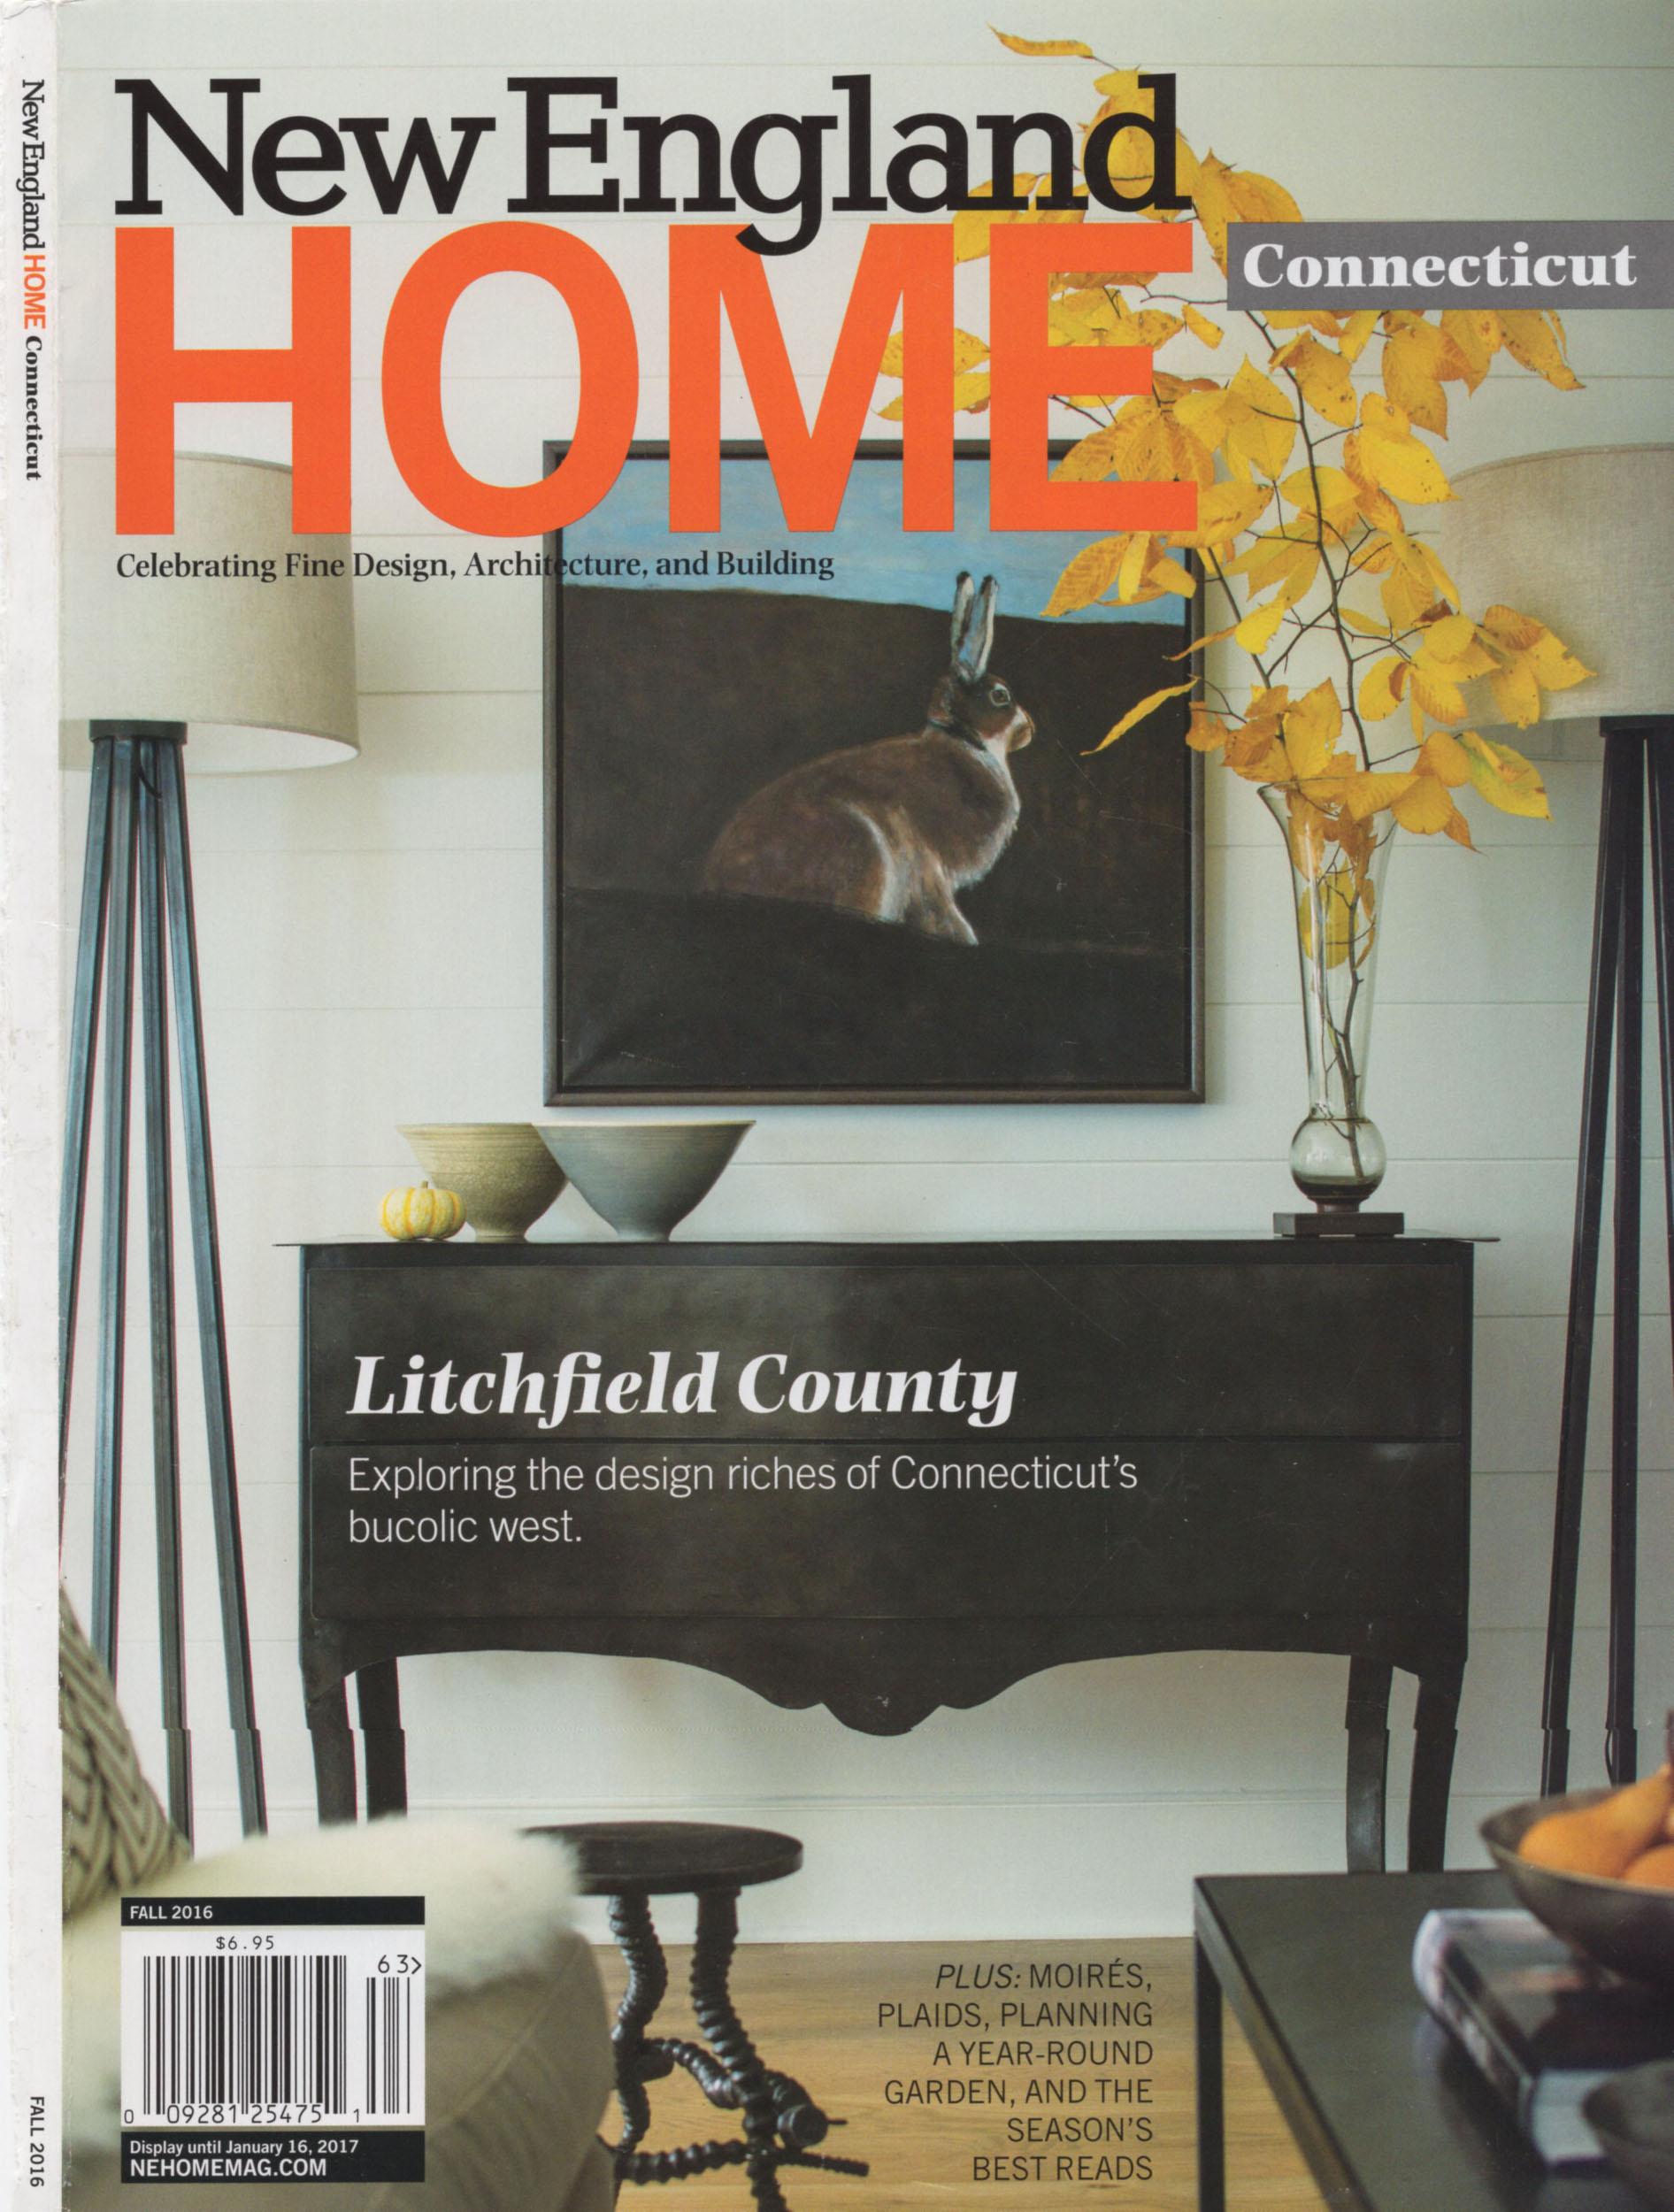 Caroline Kopp Interior Design New England Home Fall 2016 Darien CT Fairfield County Connecticut.jpg